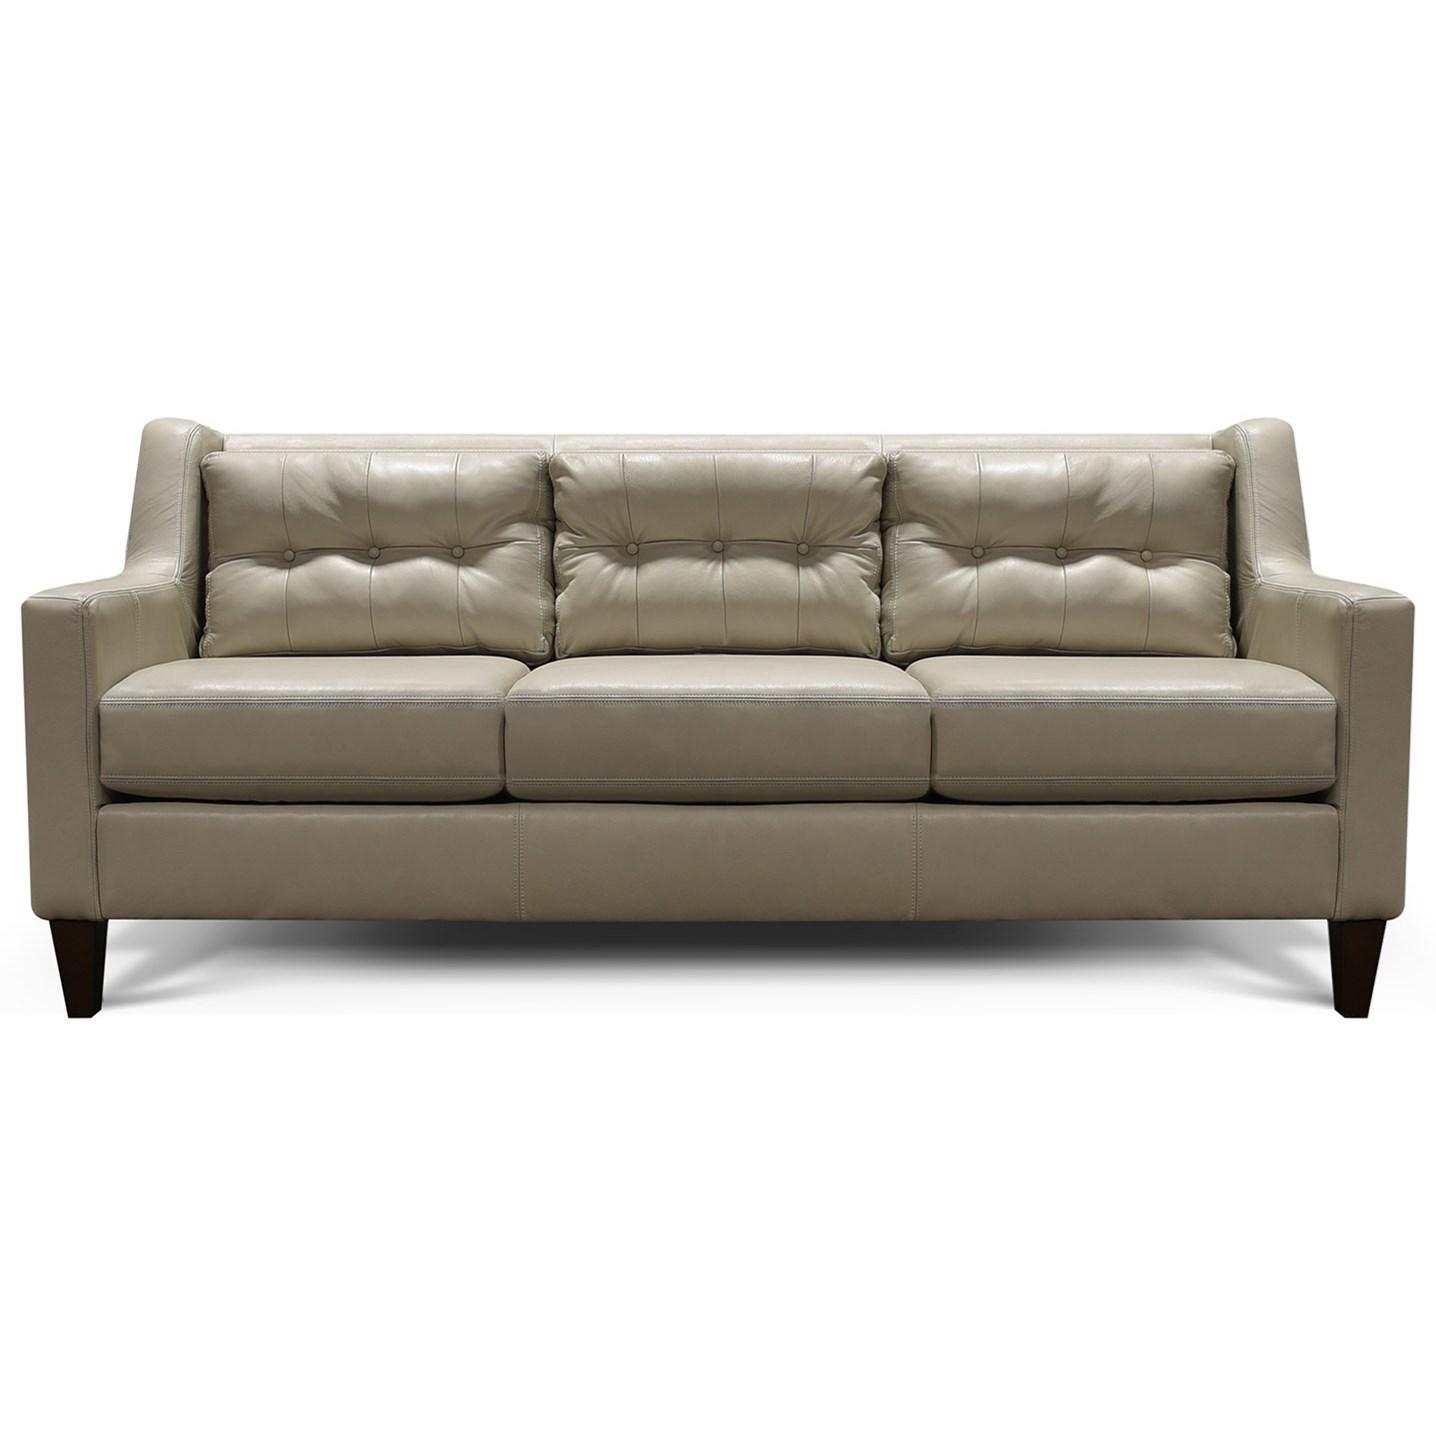 England BrodyTufted Back Sofa